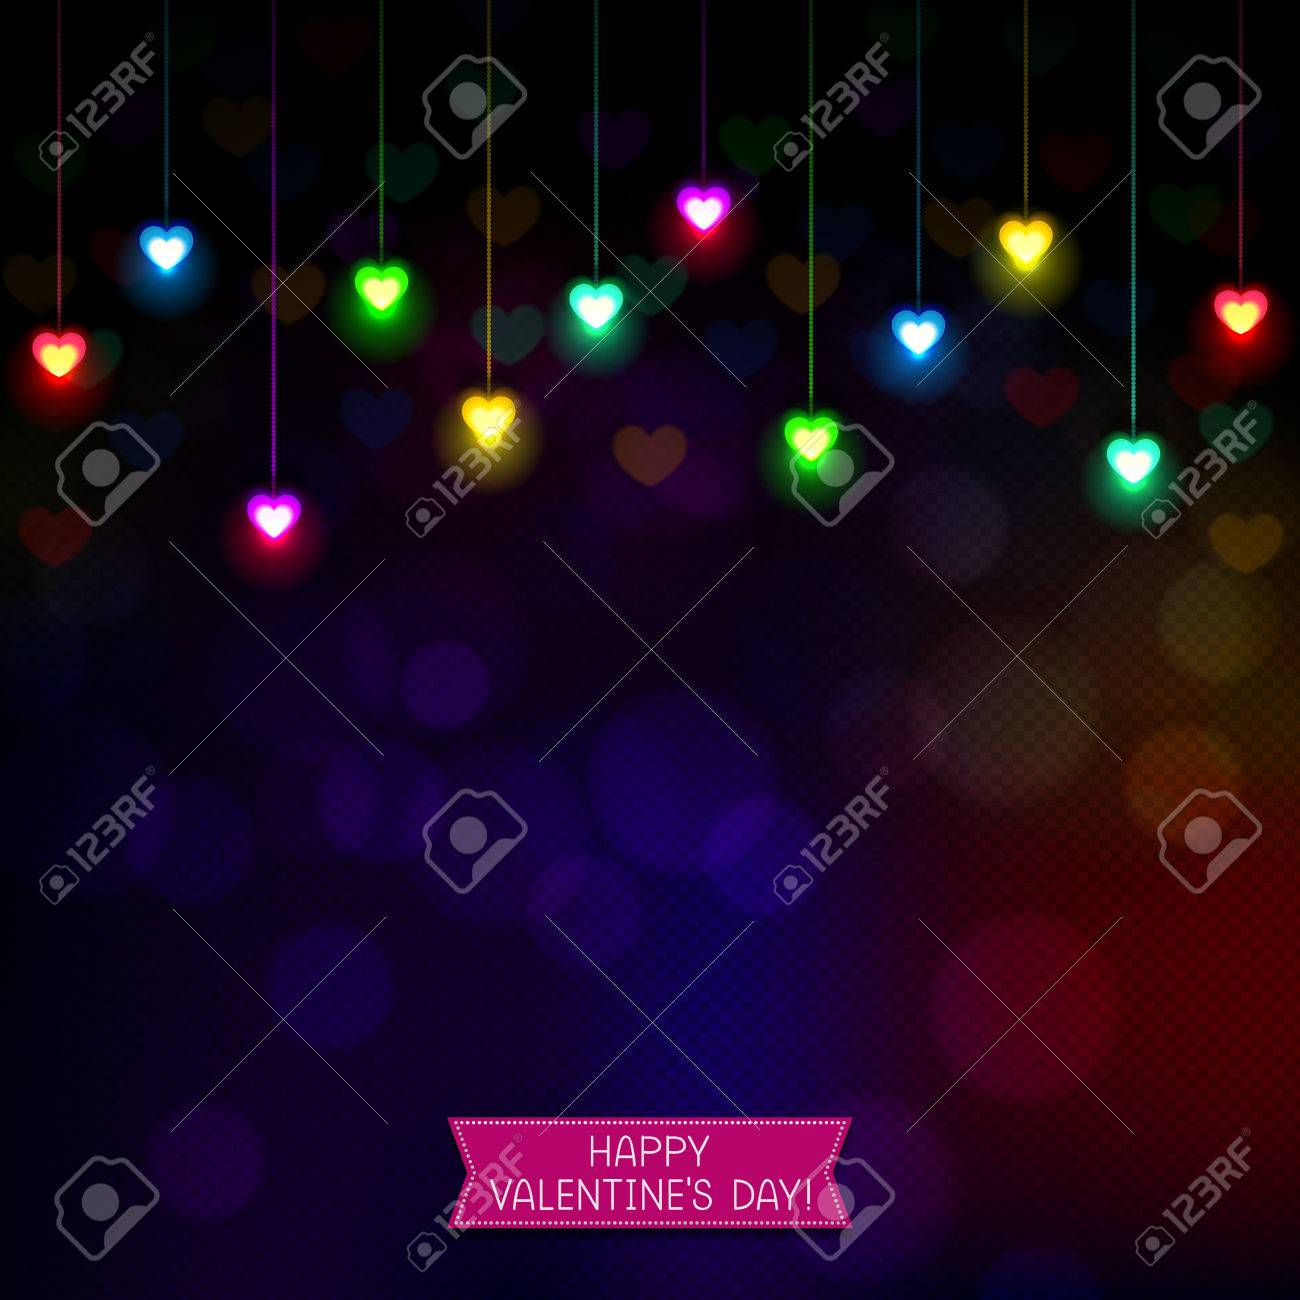 Dark stylish background light text catalog photo